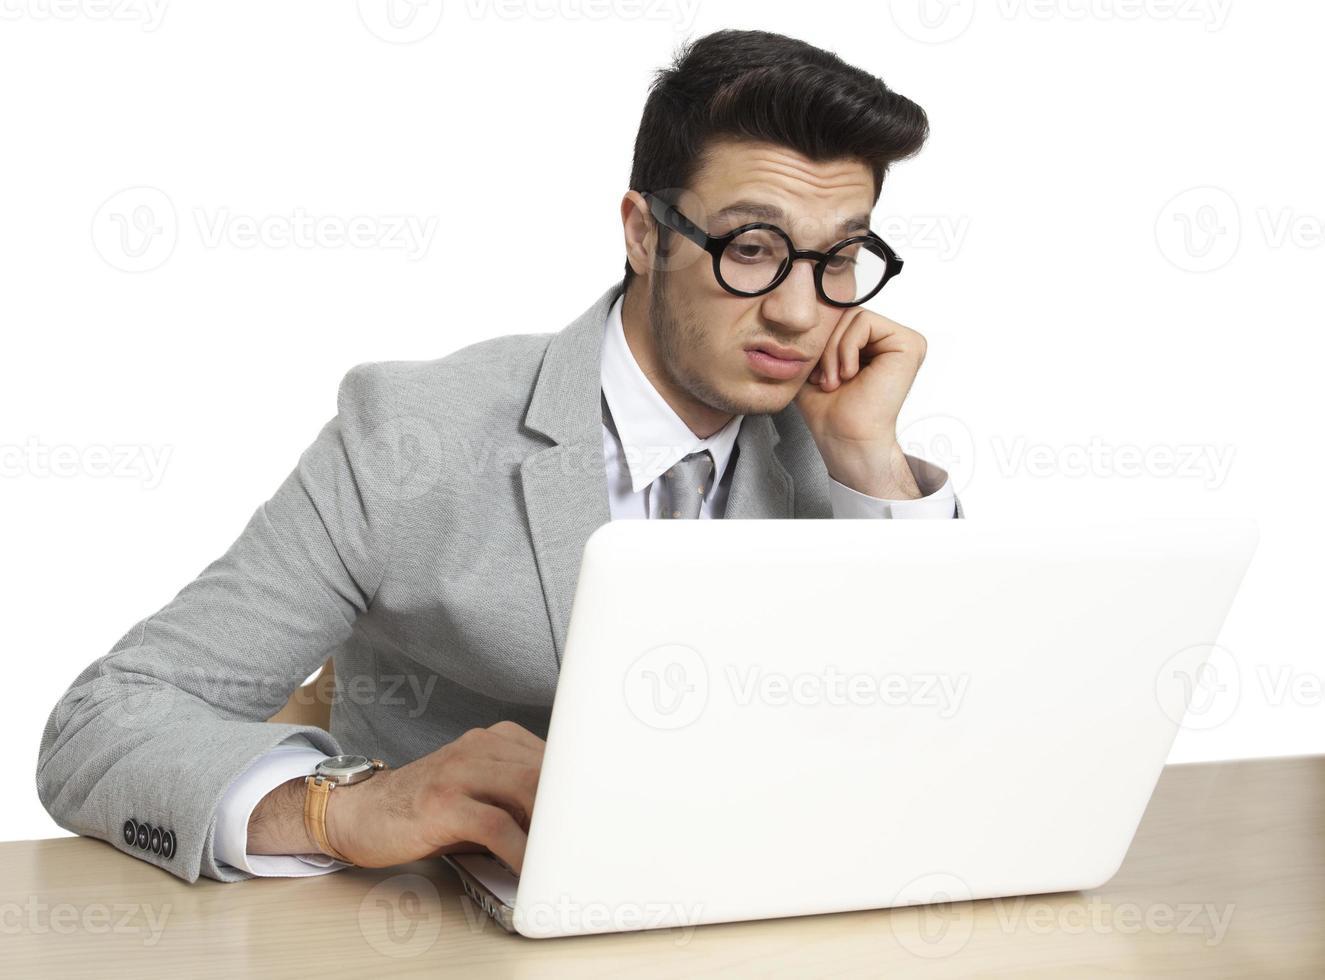 orolig affärsman i stress foto